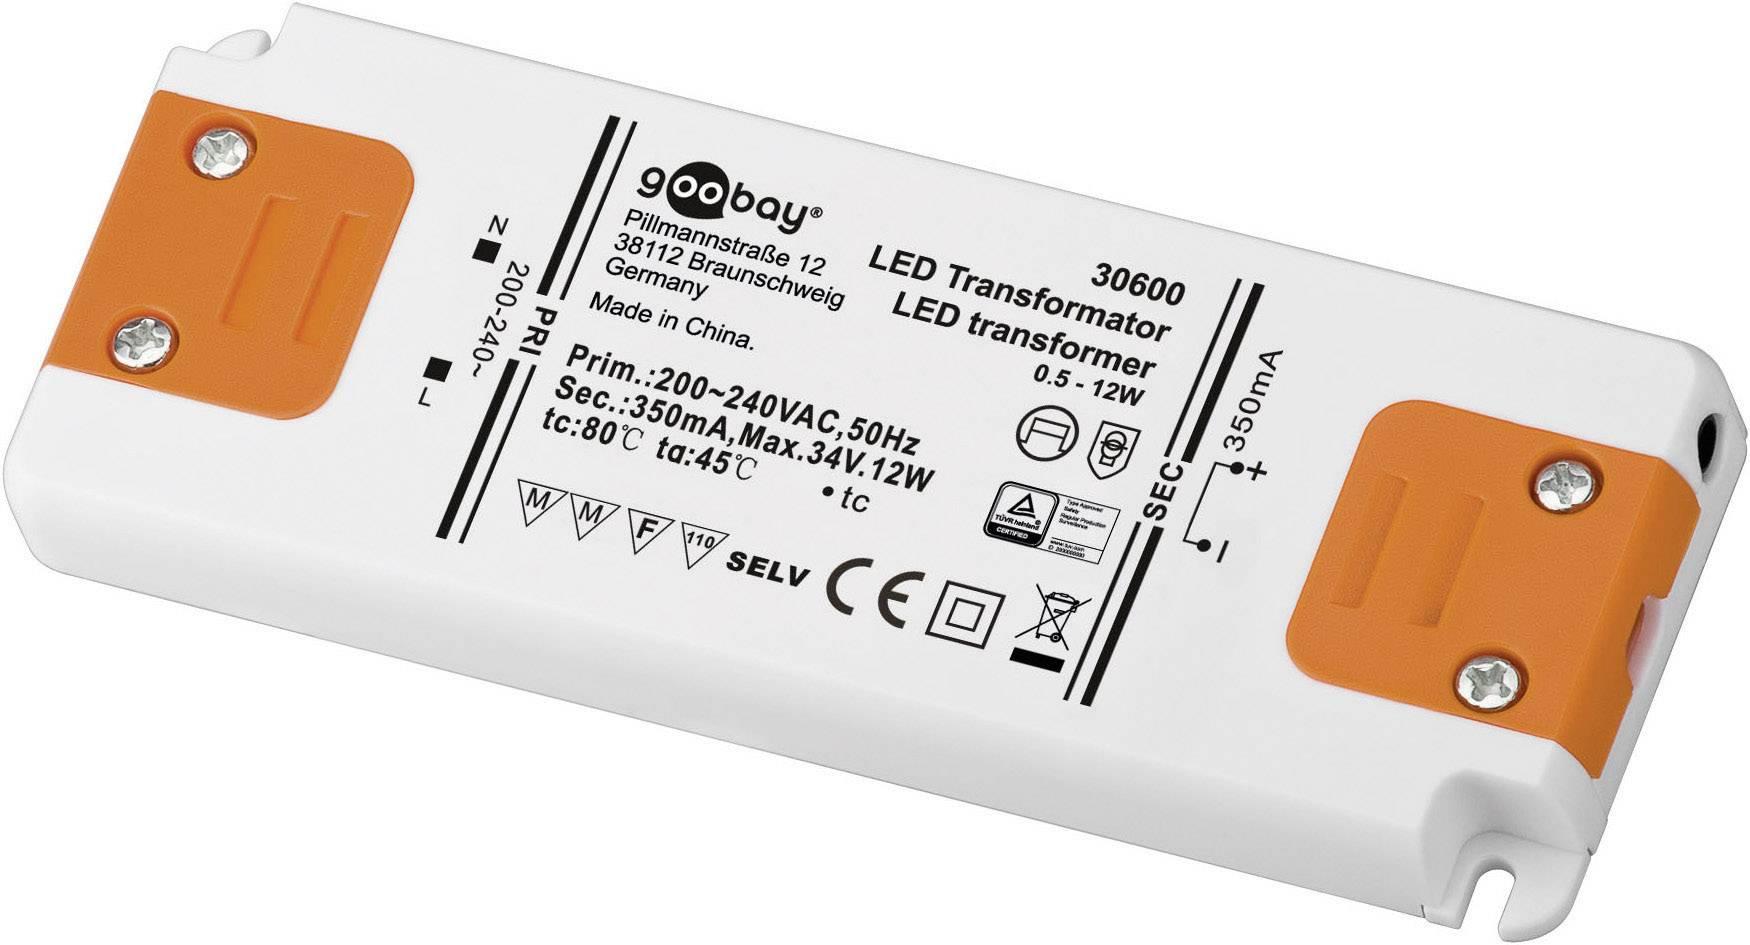 Vstavateľný LED driver Goobay SET CC 350-12 LED, 12 W (max), 0.35 A, 0 - 34 V/DC